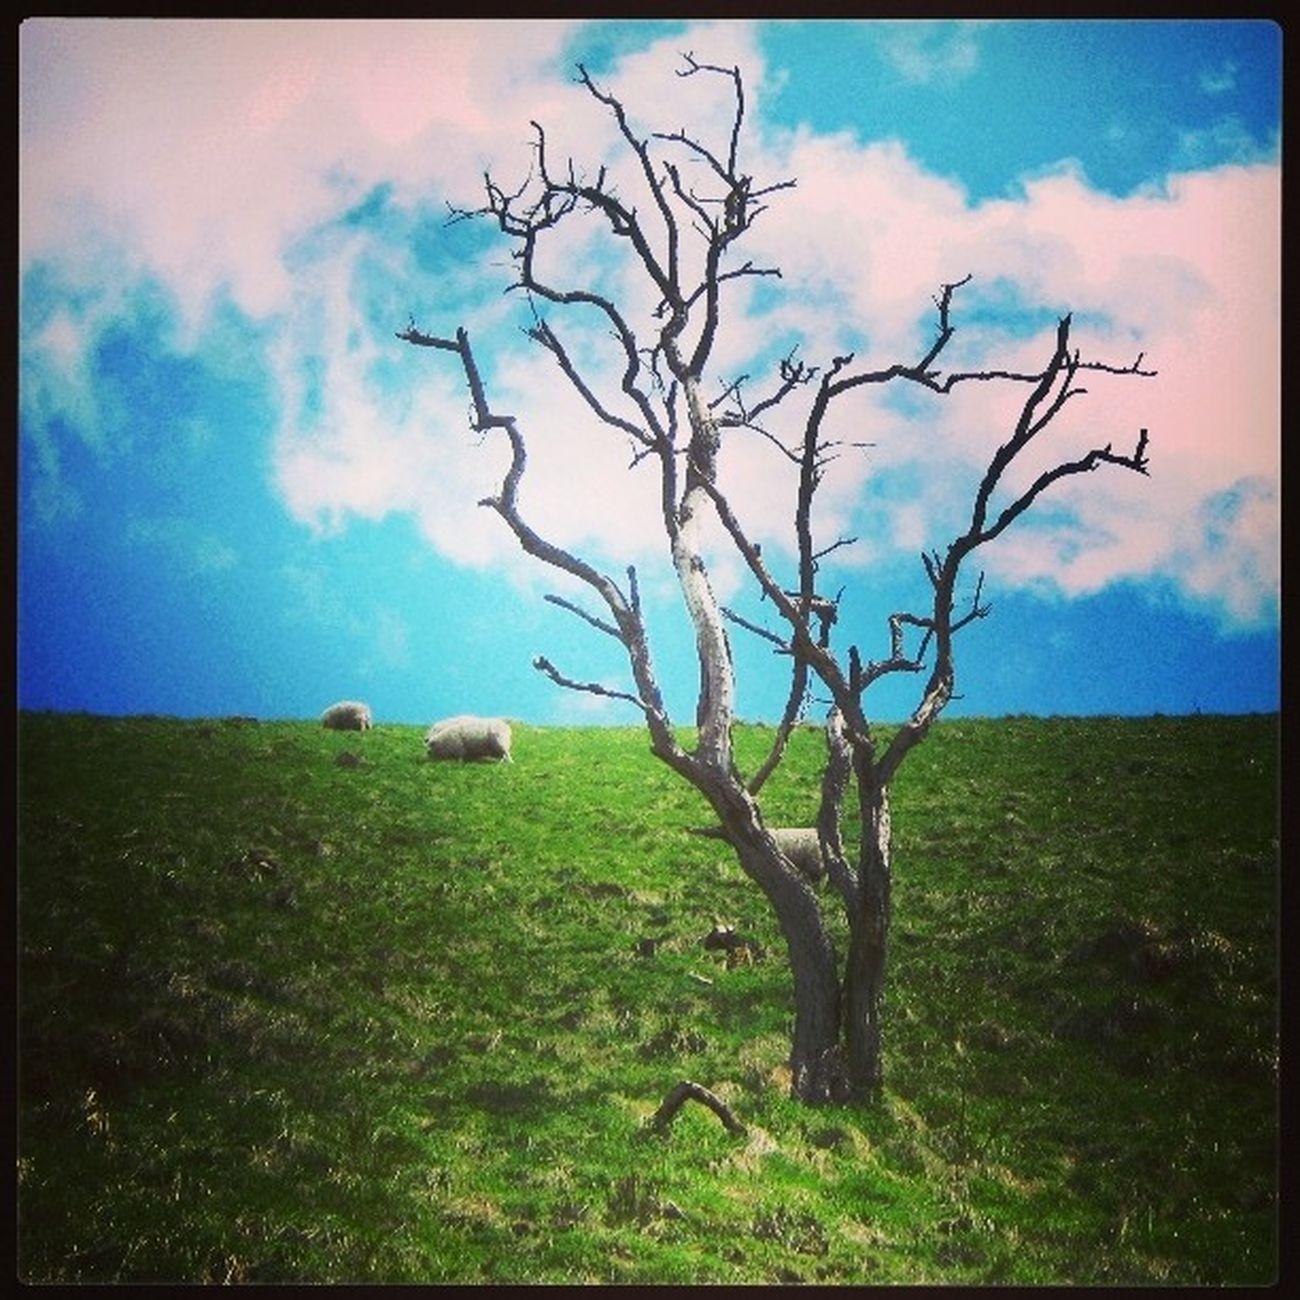 Tree Nature Photooftheday Instafaily England DoveHale Walk Sheep Polishphotographer Polishgirl Grass Awesome Walk Winter Spring Owca Pastwisko Samotnosc Loneliness